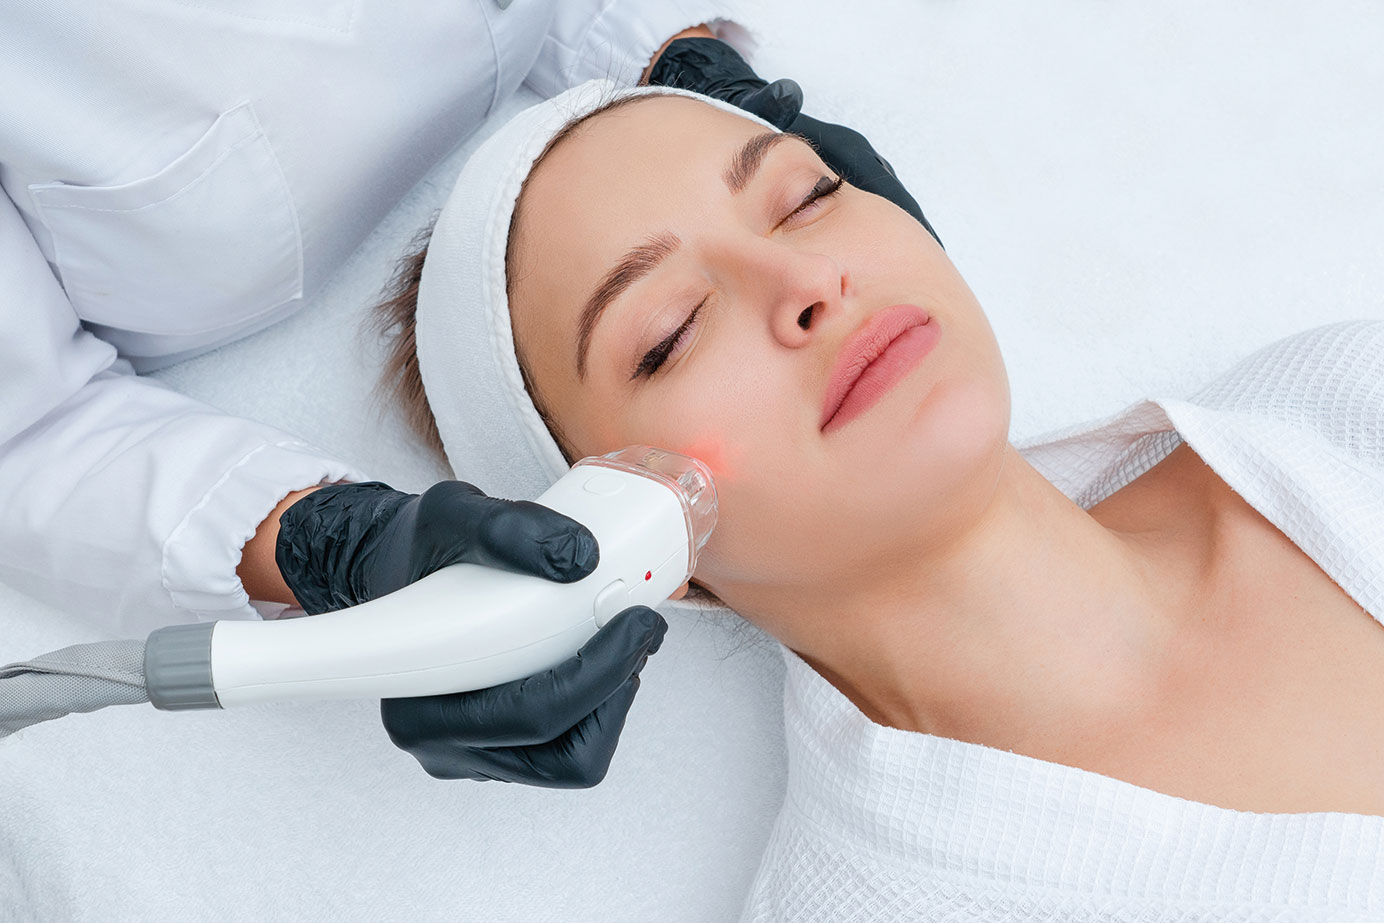 Kosmetik, Gesichtsbehandlung, Laserbehandlung, Pigmentflecken, Seeboden, Spittal